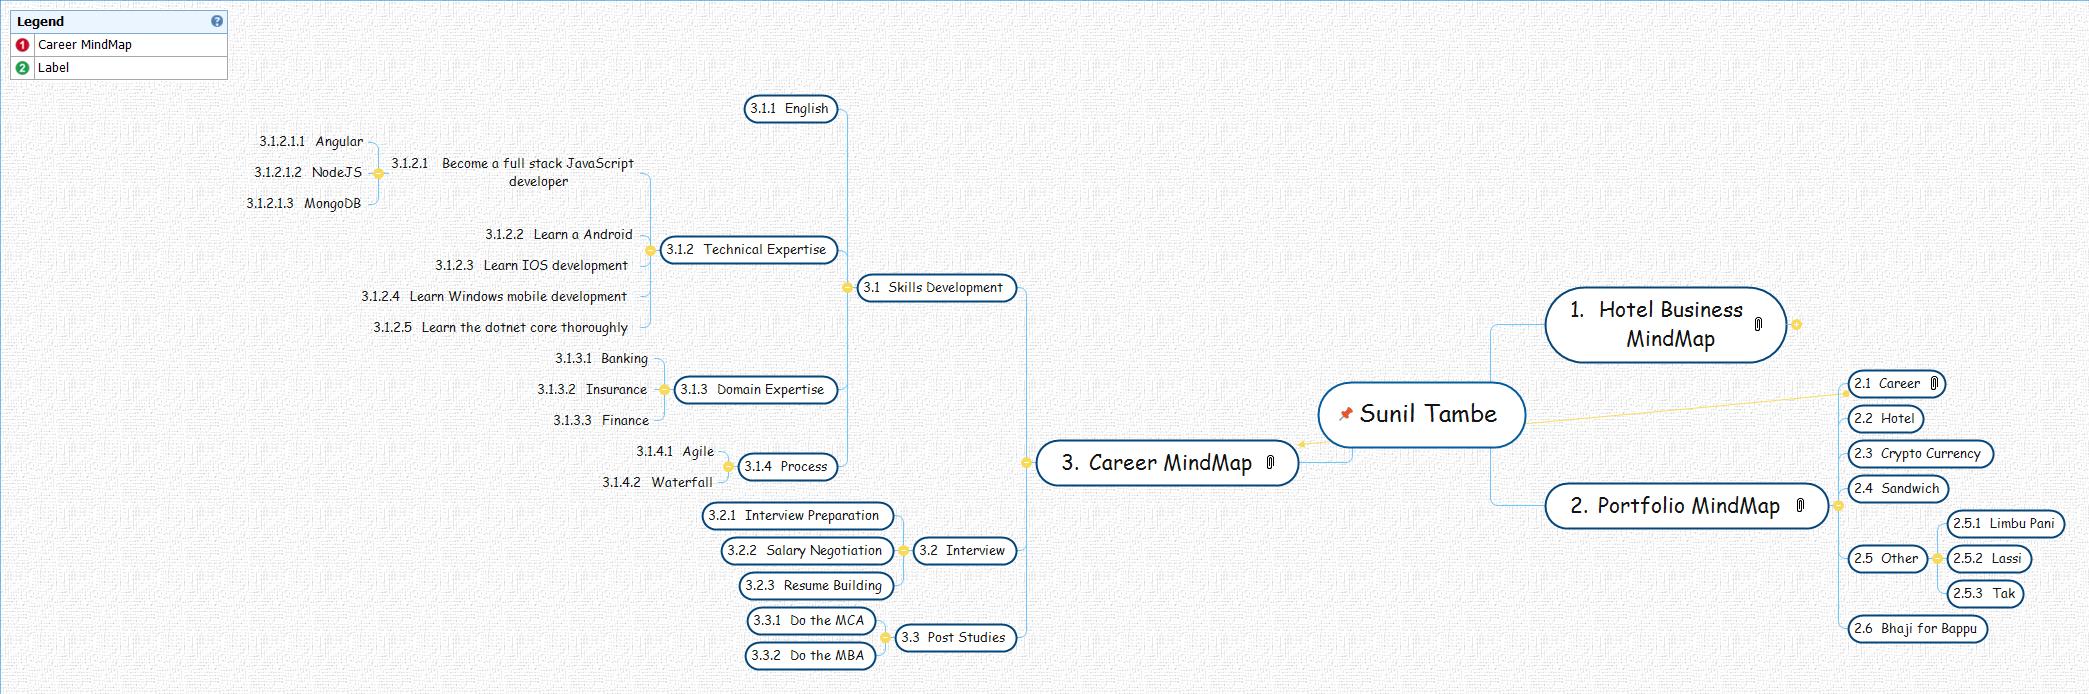 Sunil Tambe Mind Map